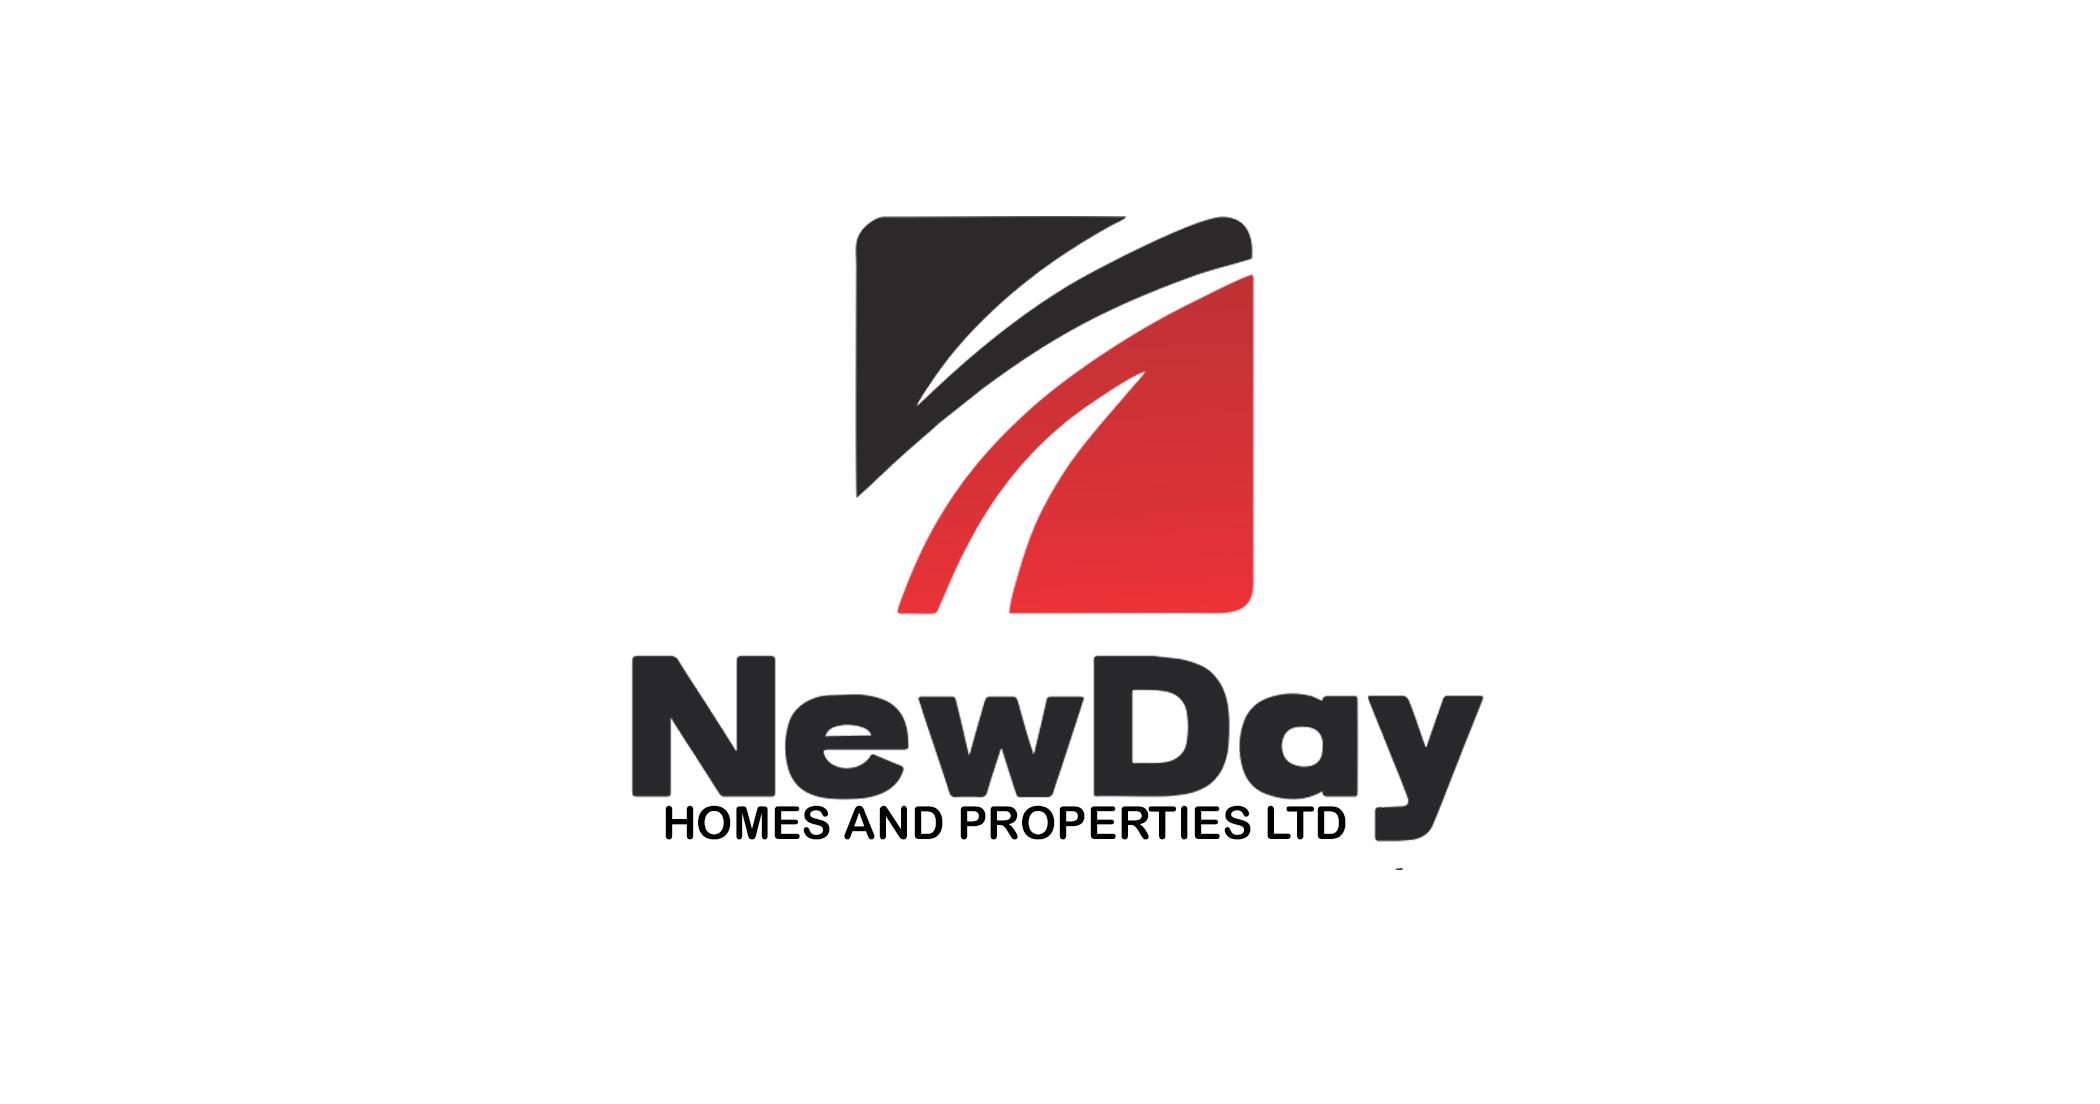 Newday Integrated Construction Boss, Otunba Oluwole Sholola Launches Newday Homes & Properties